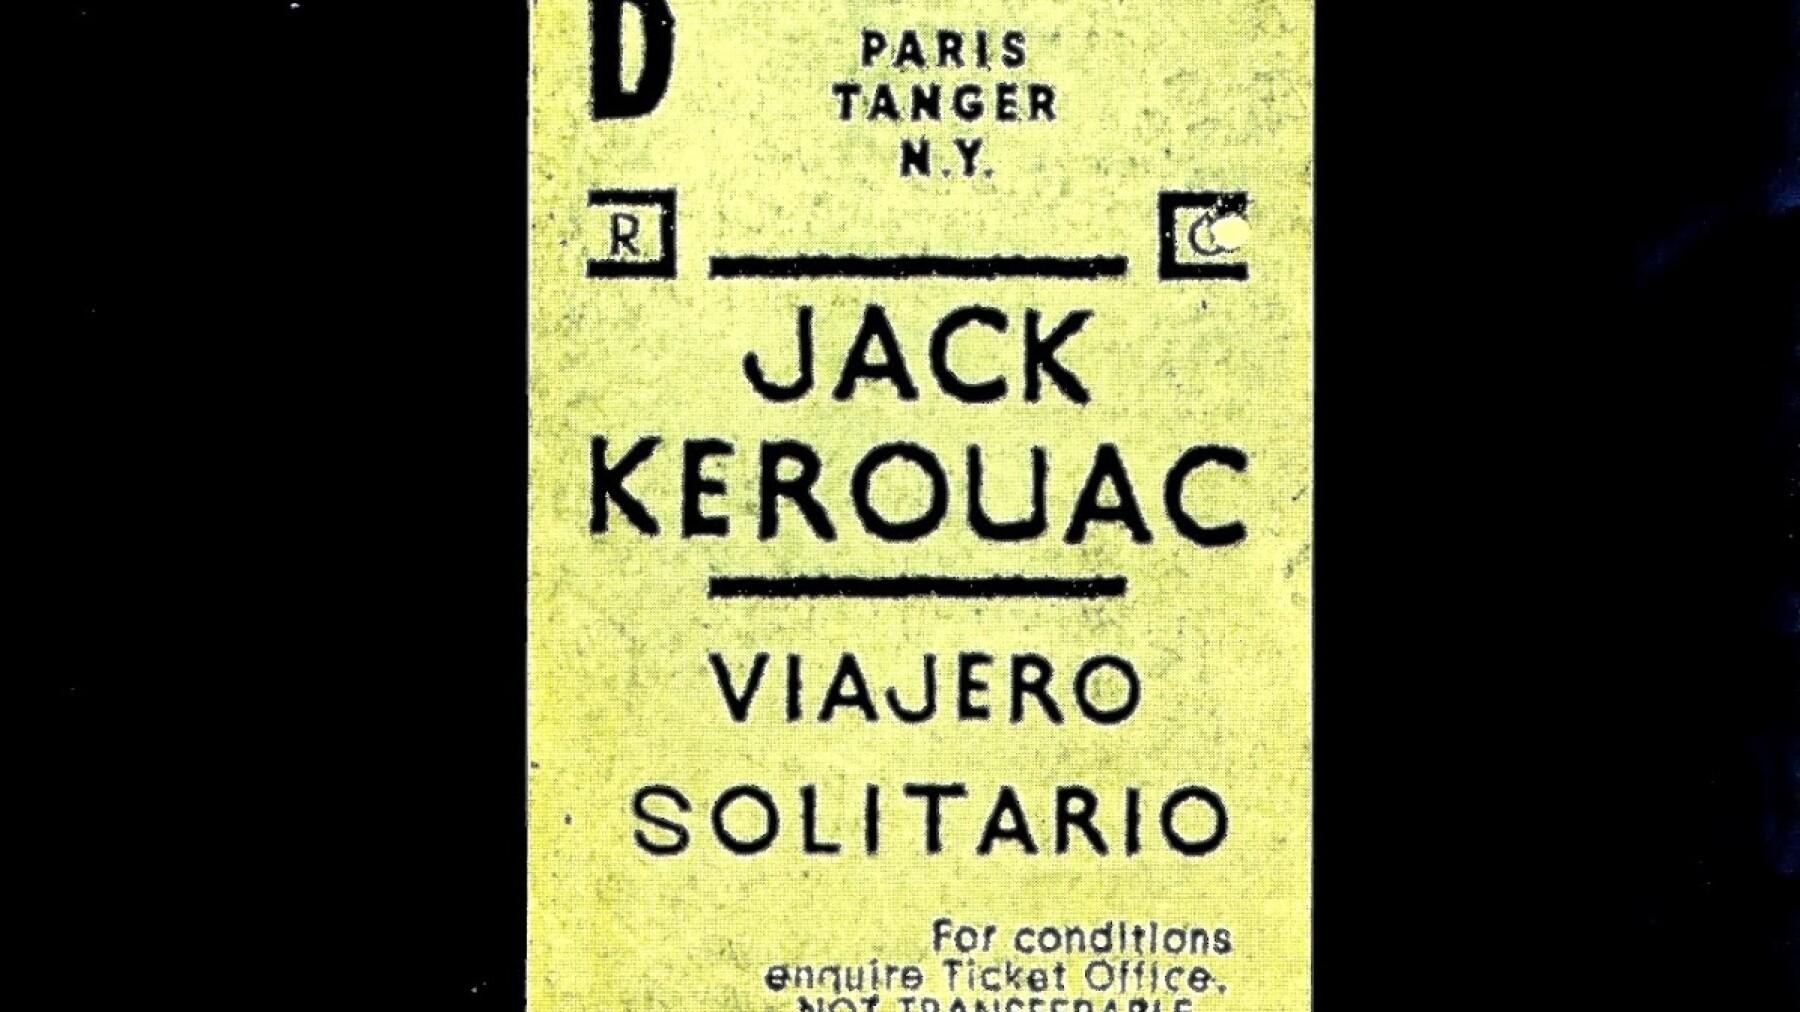 Viajero solitario, de Jack Kerouac.